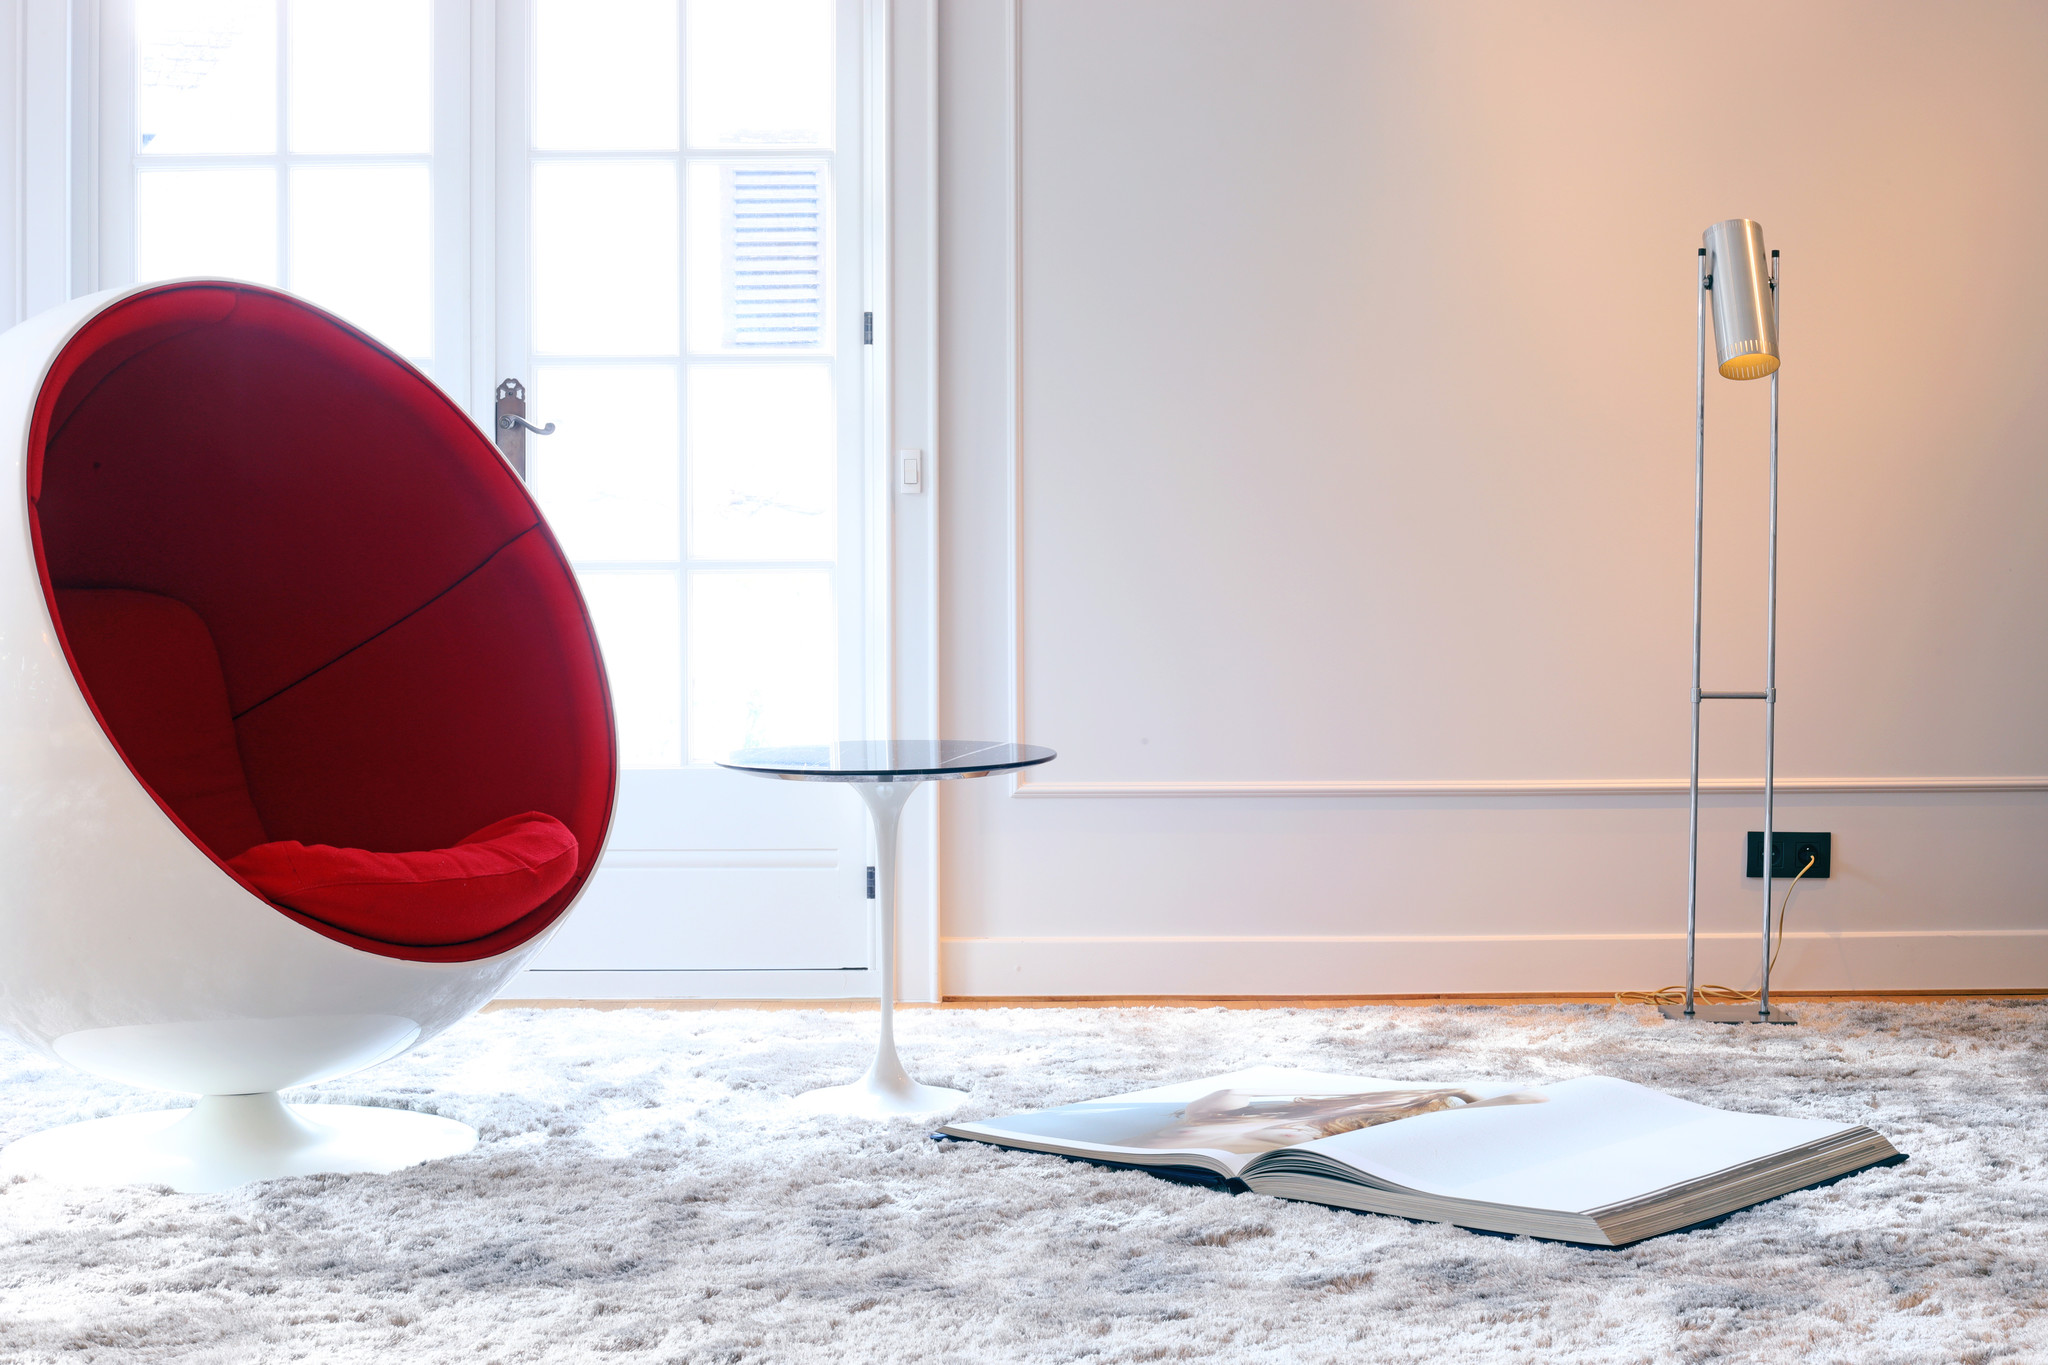 Knoll side table designed by Eero Saarinen, 1950's